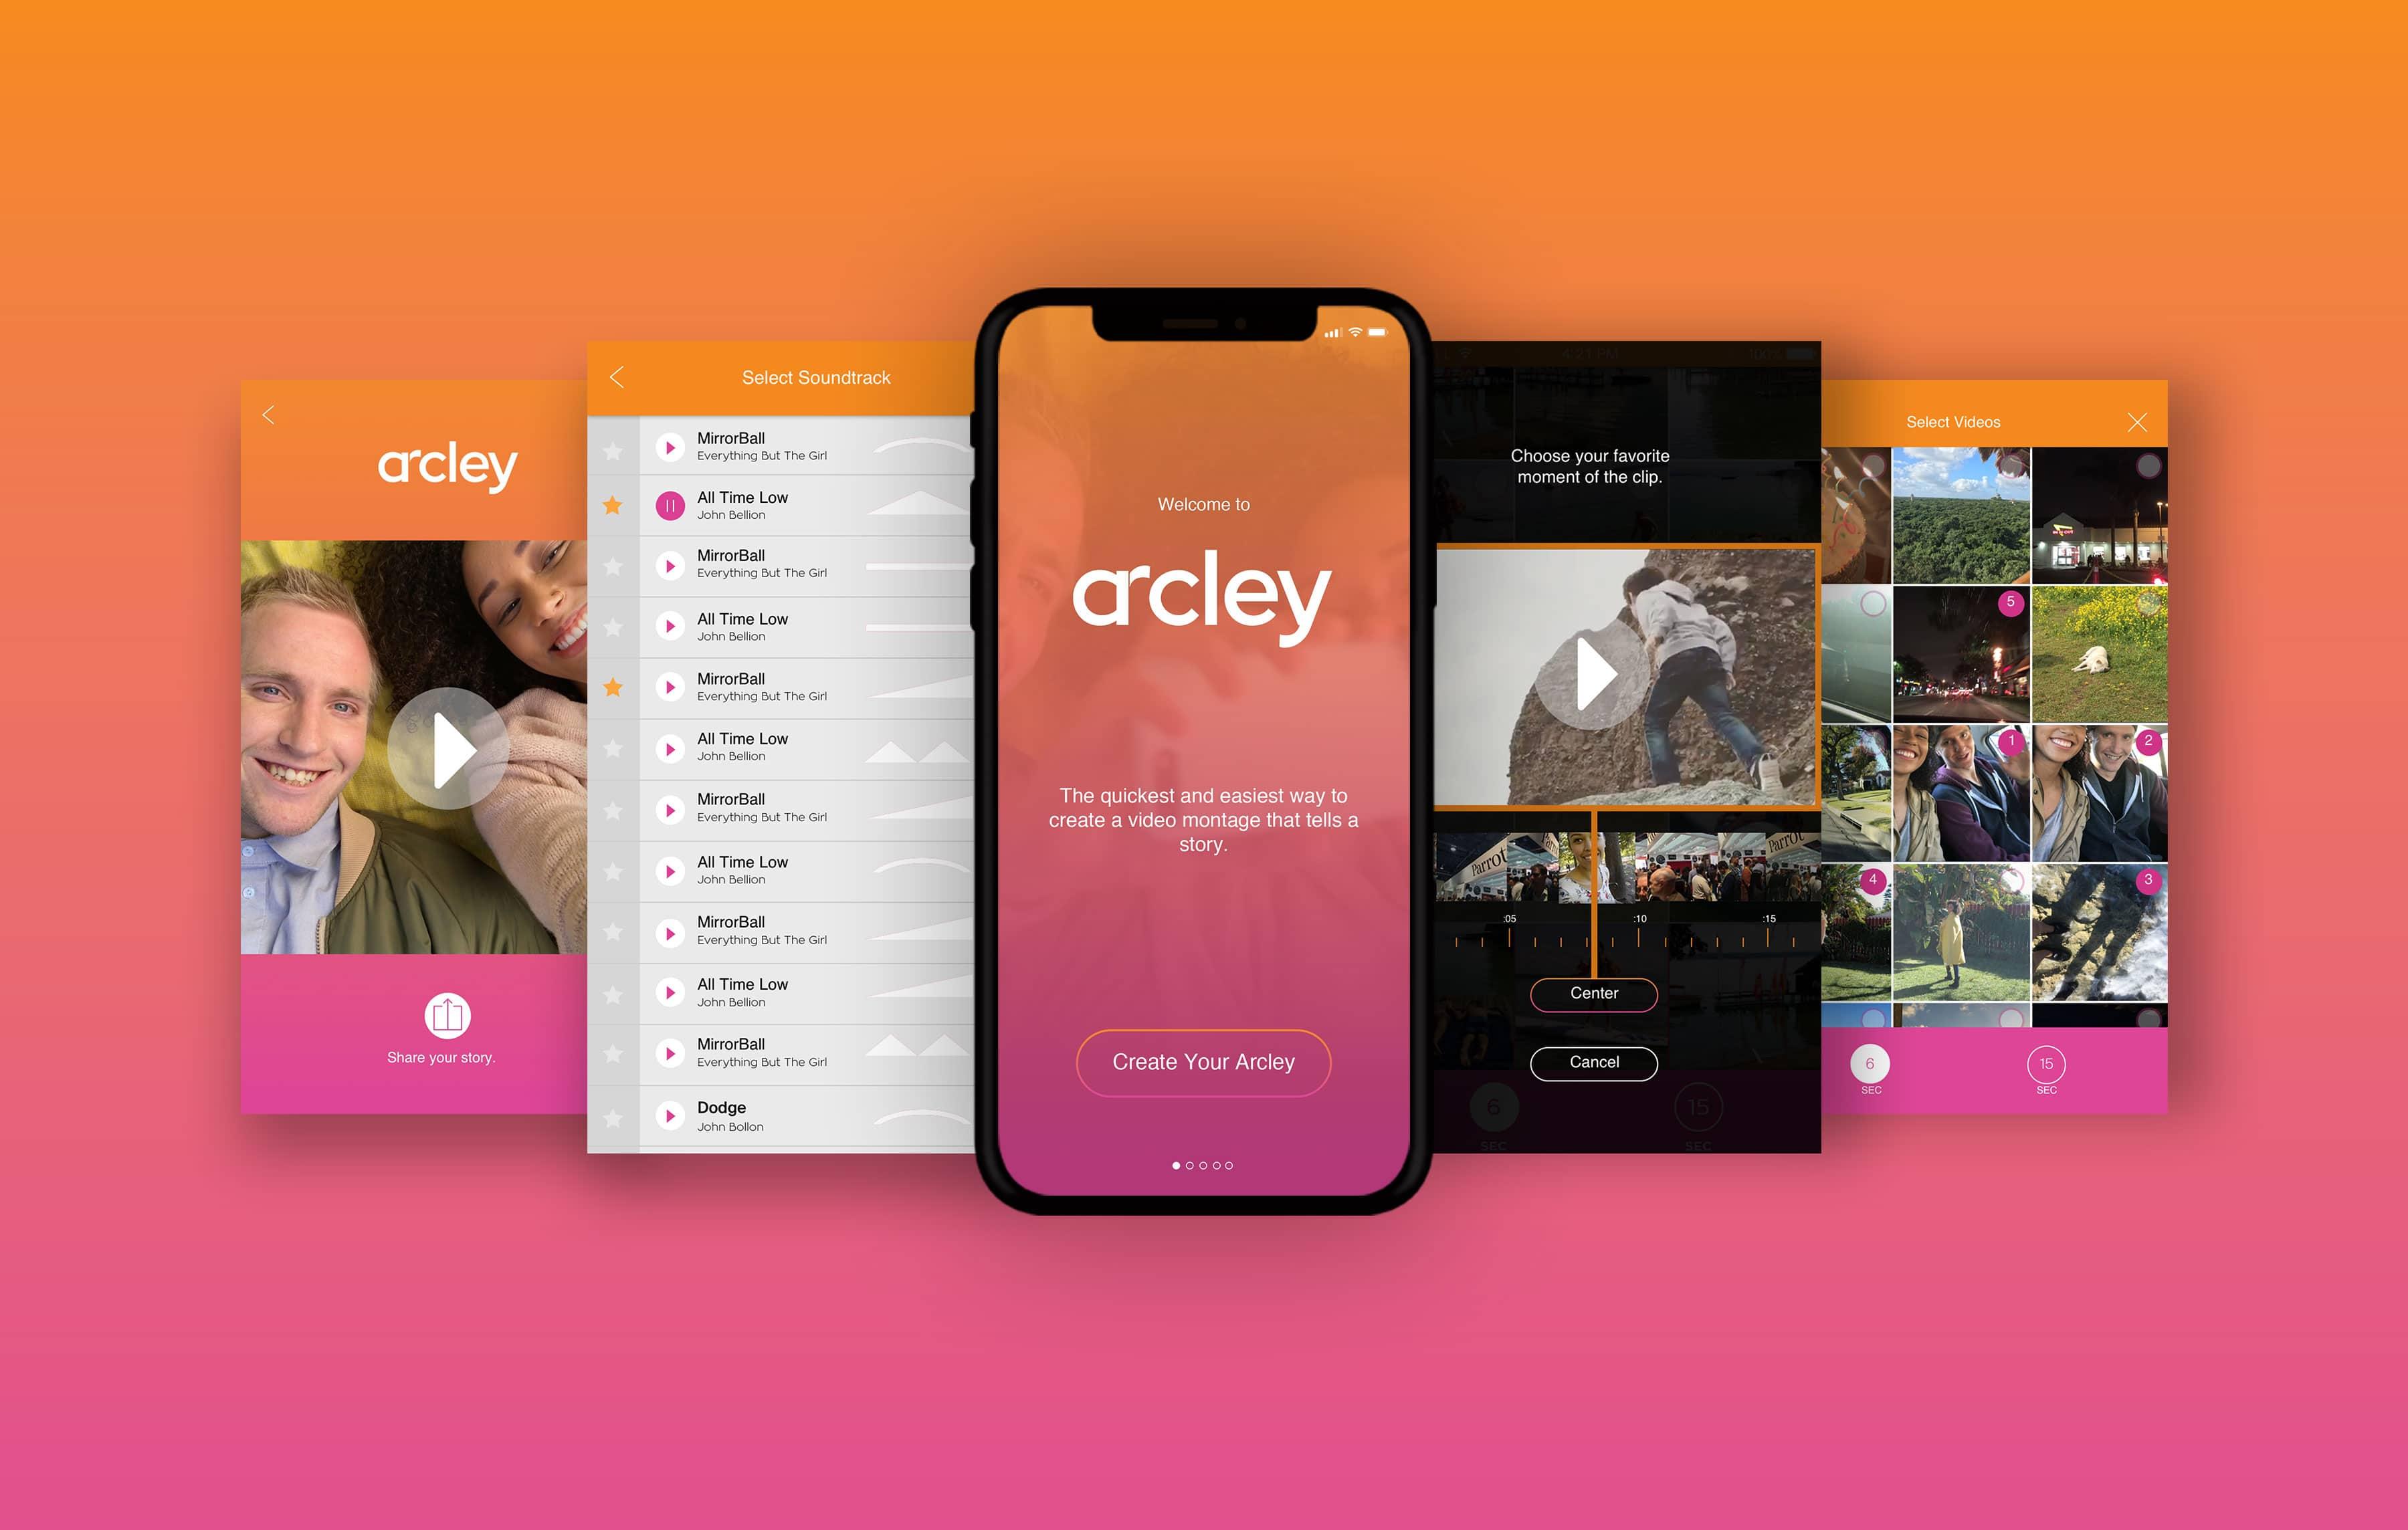 arcley app